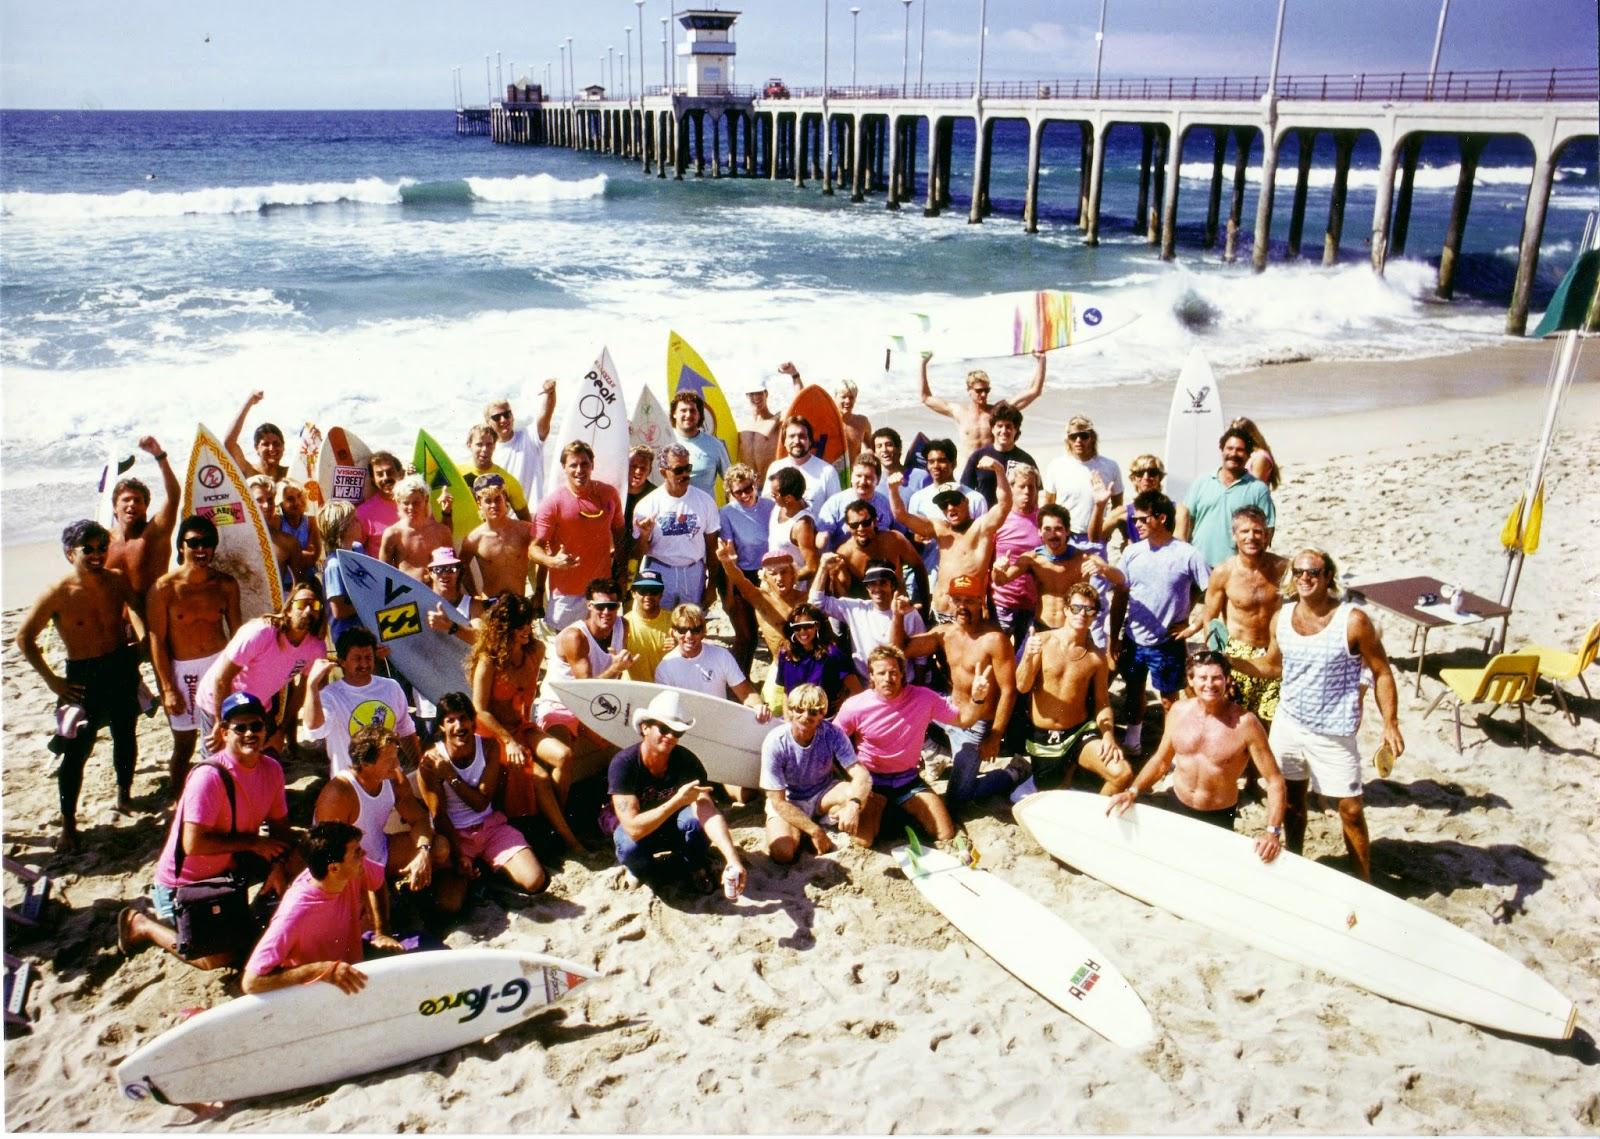 Historic Huntington Beach 1914 To 2014 Huntington Beach